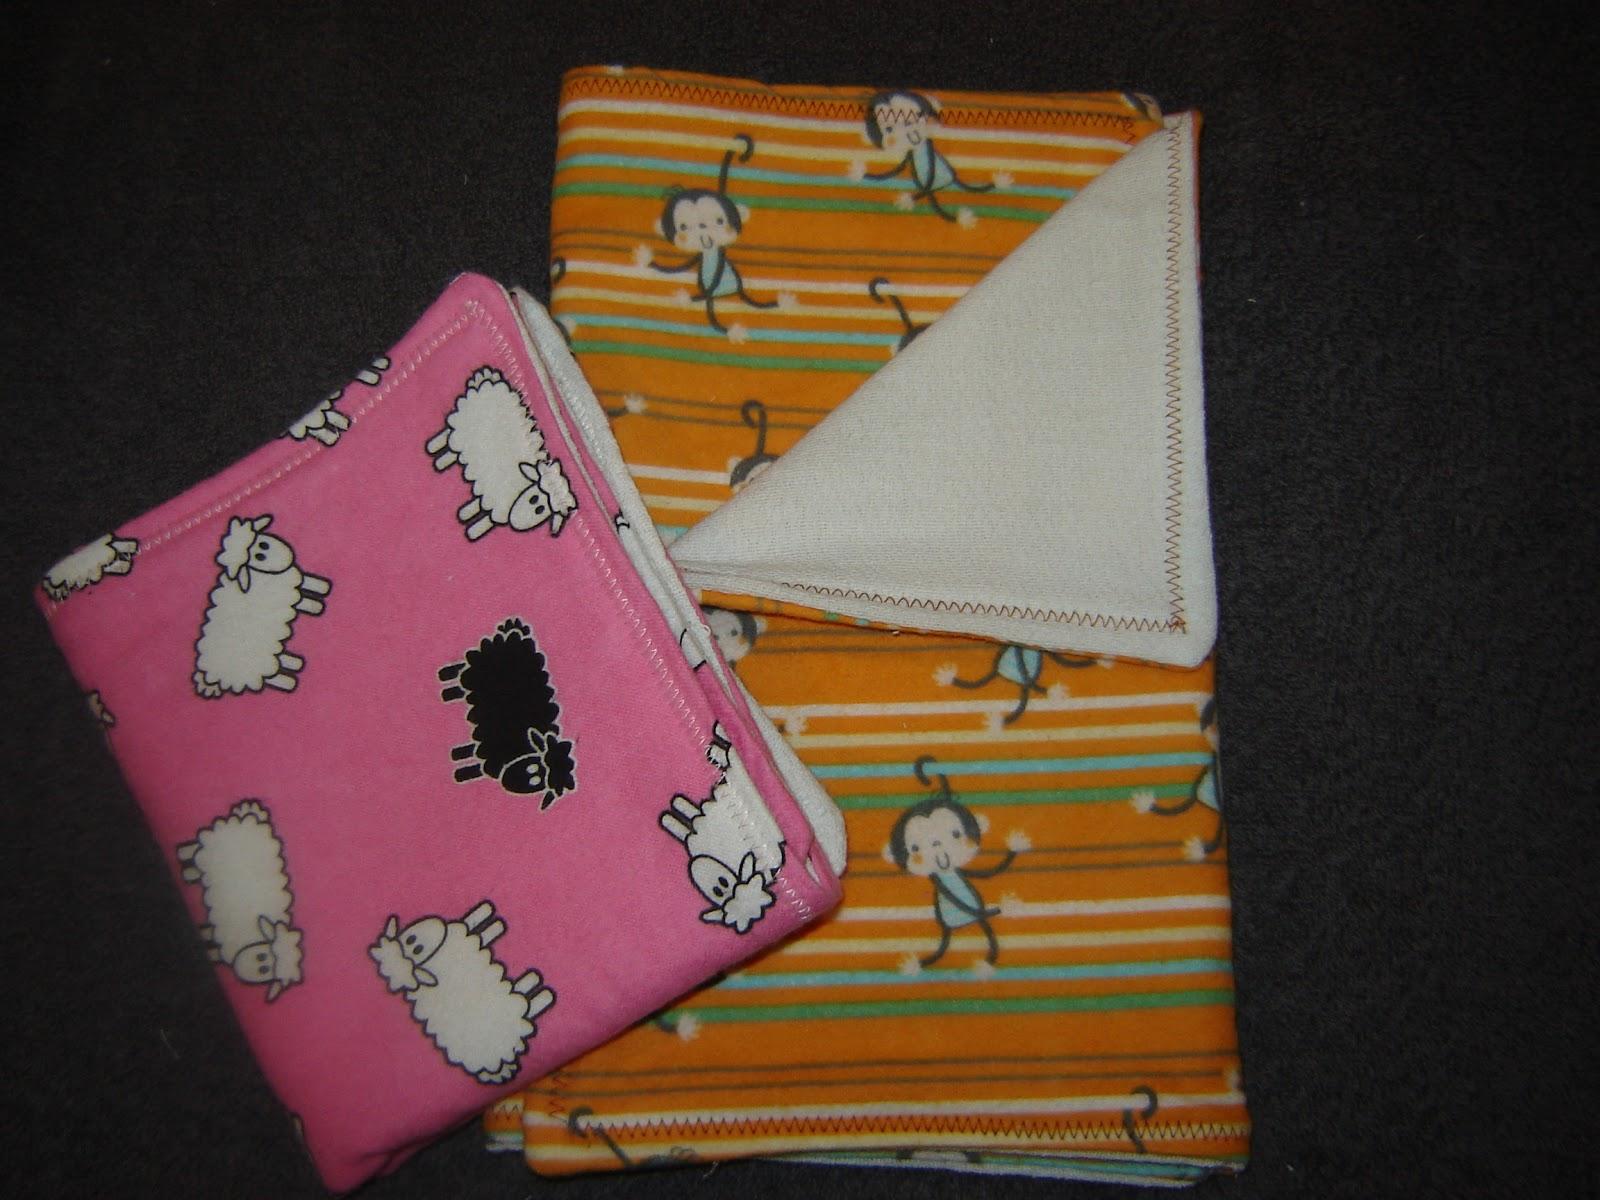 She who makes handmade burp cloth tutorial handmade burp cloth tutorial baditri Image collections